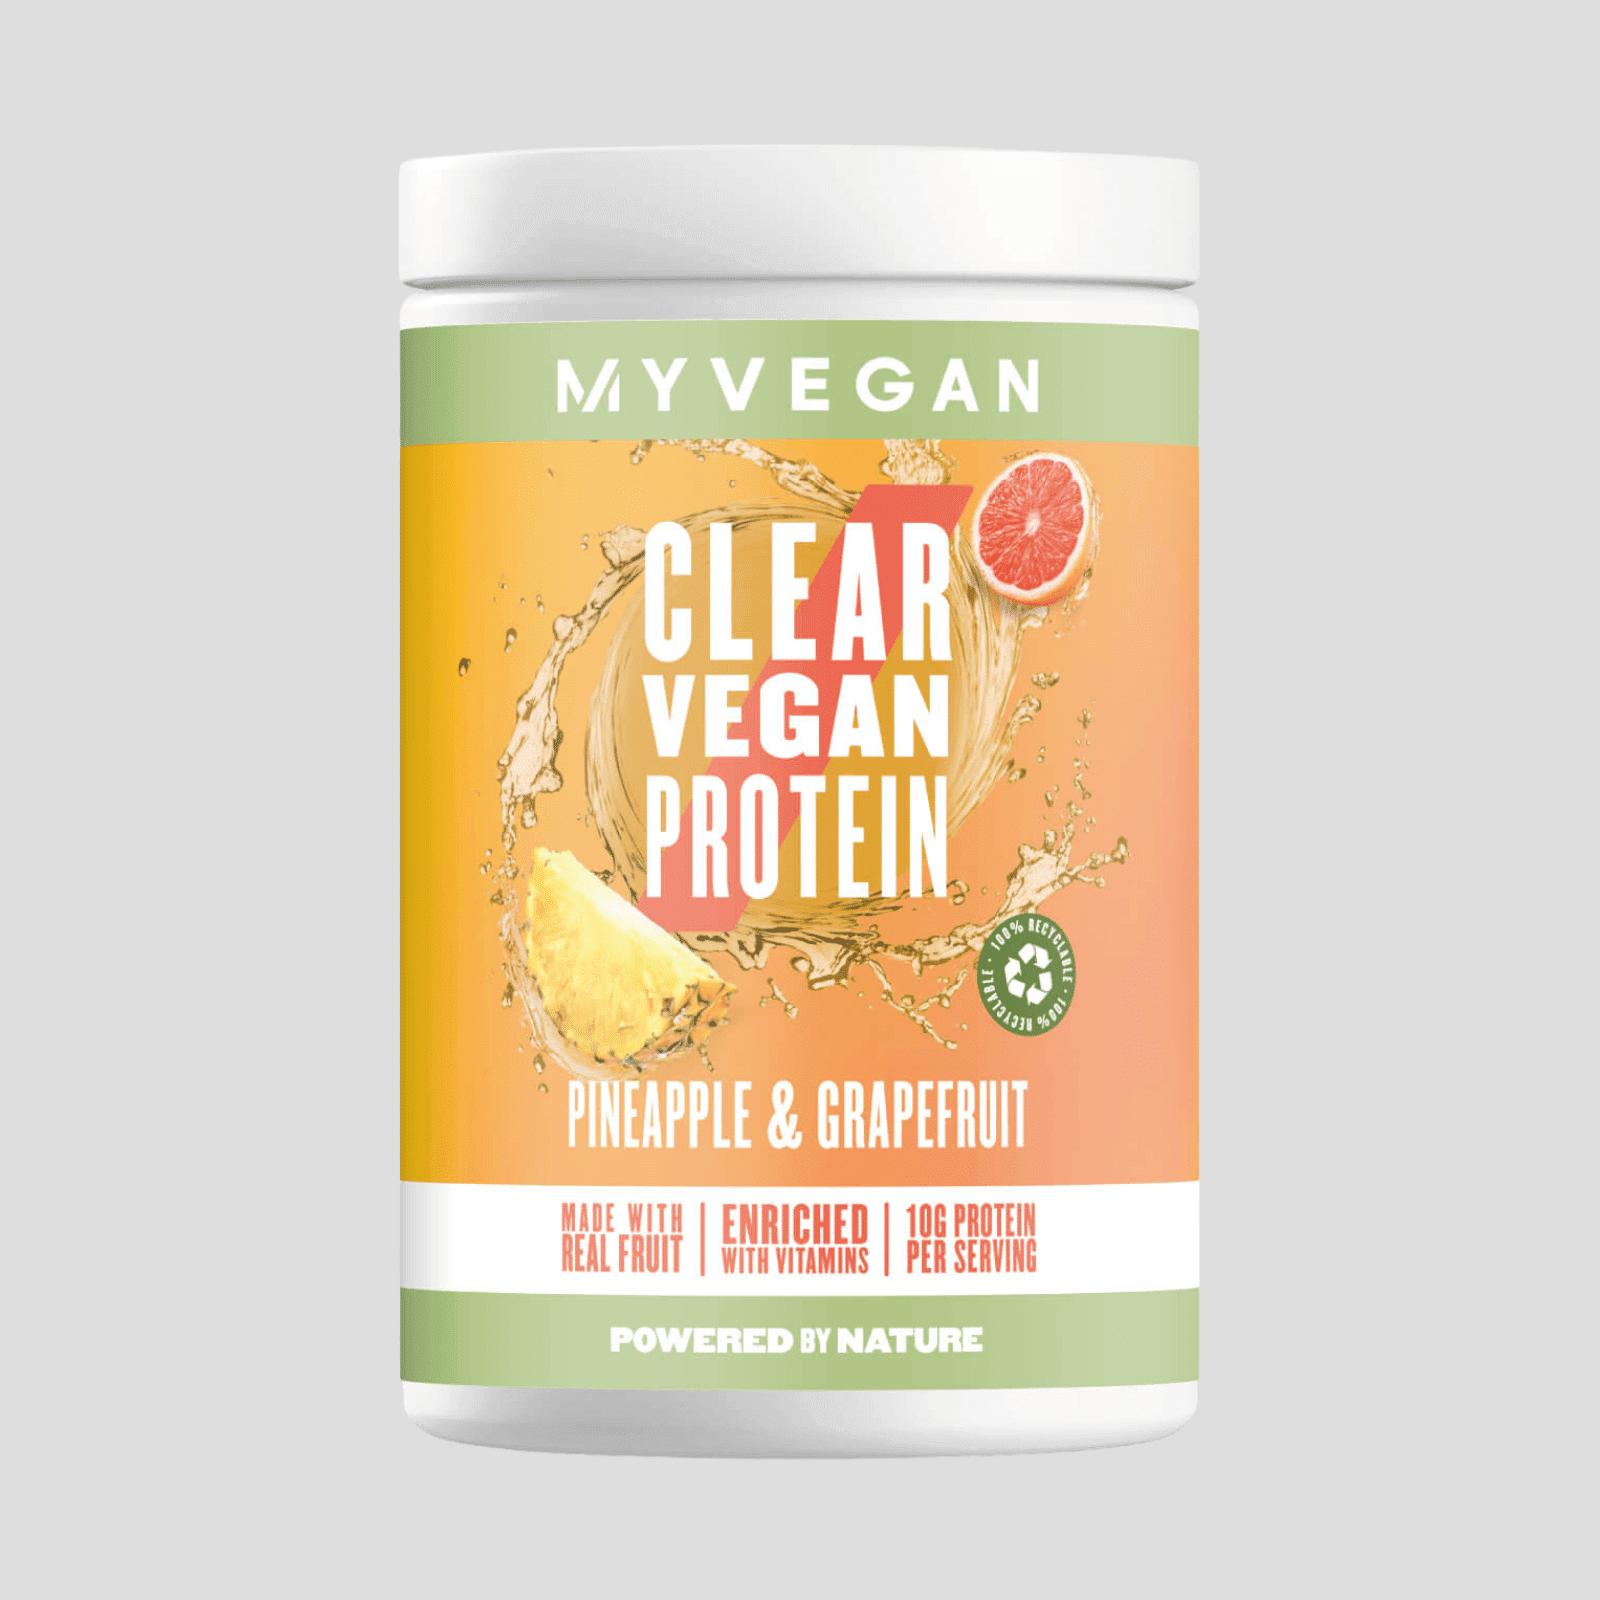 Myvegan Clear Vegan Protein - 40servings - Pineapple & Grapefruit